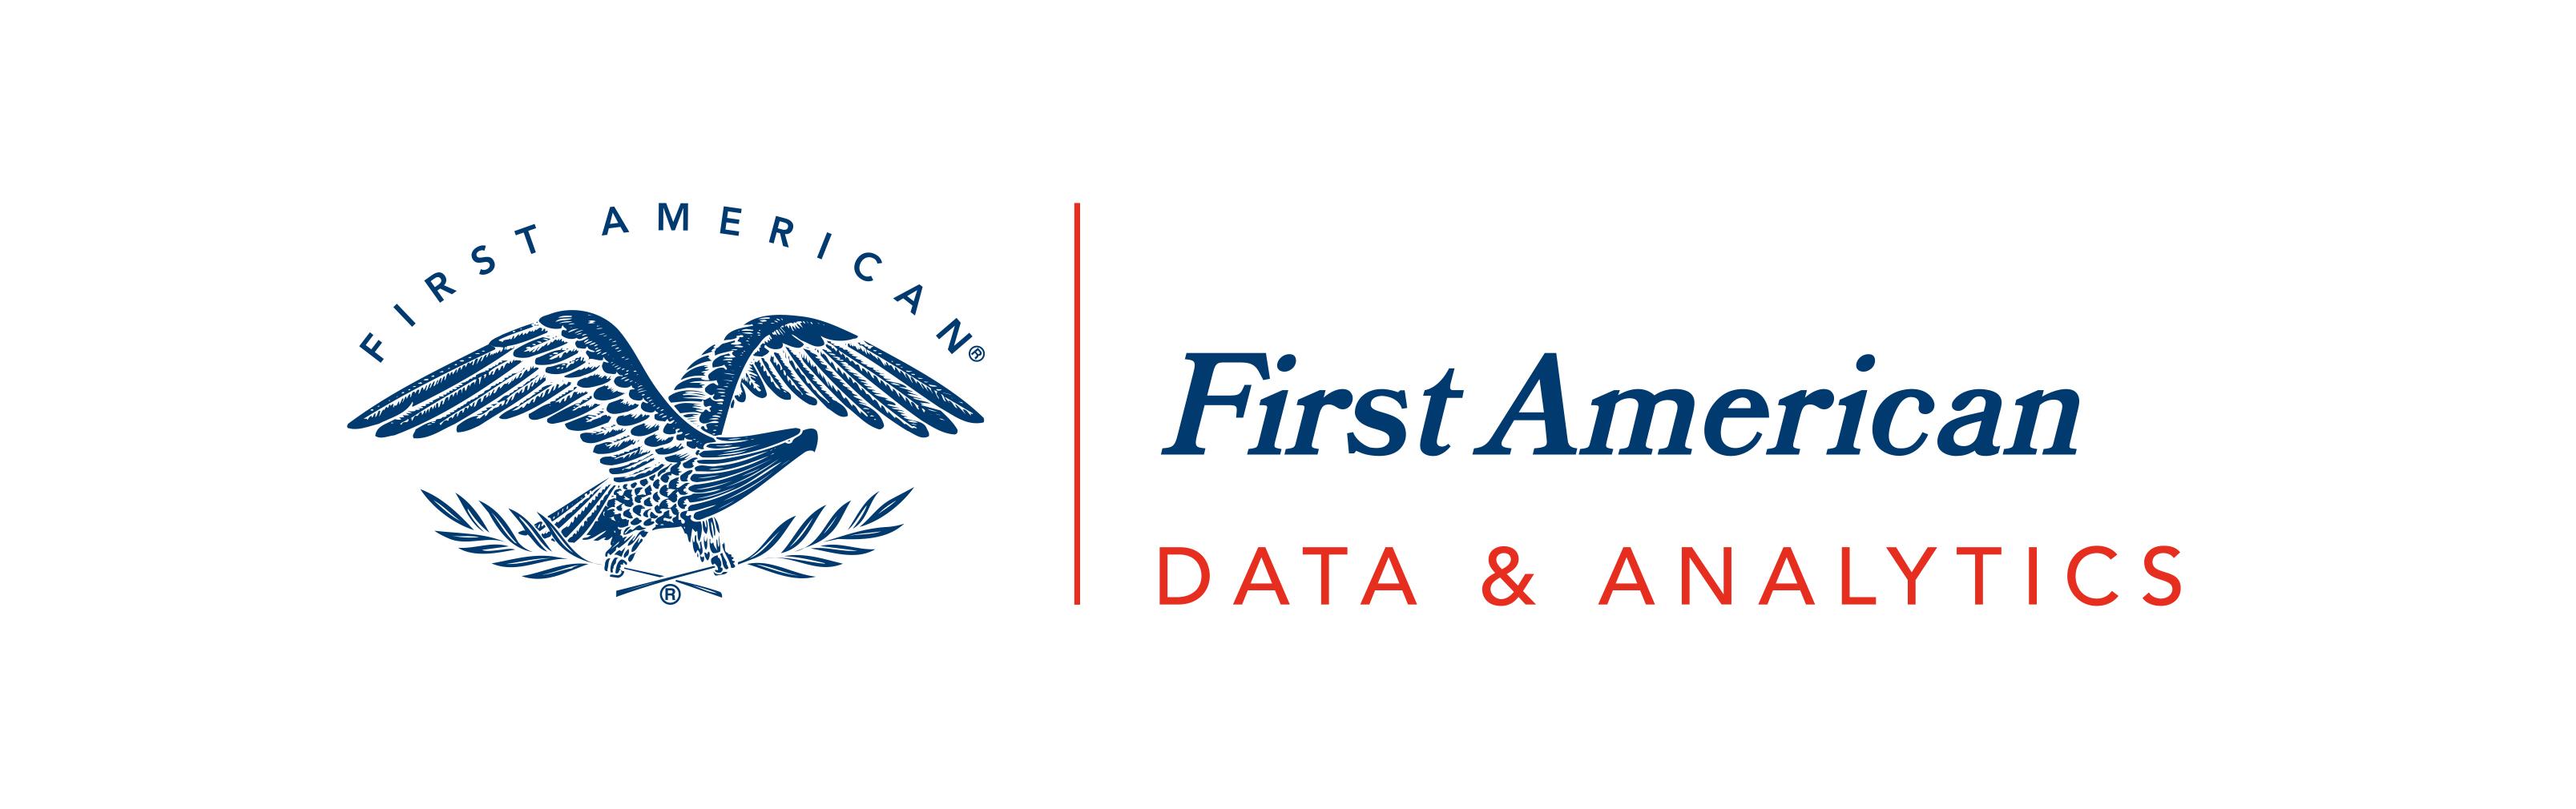 First American Data & Analytics